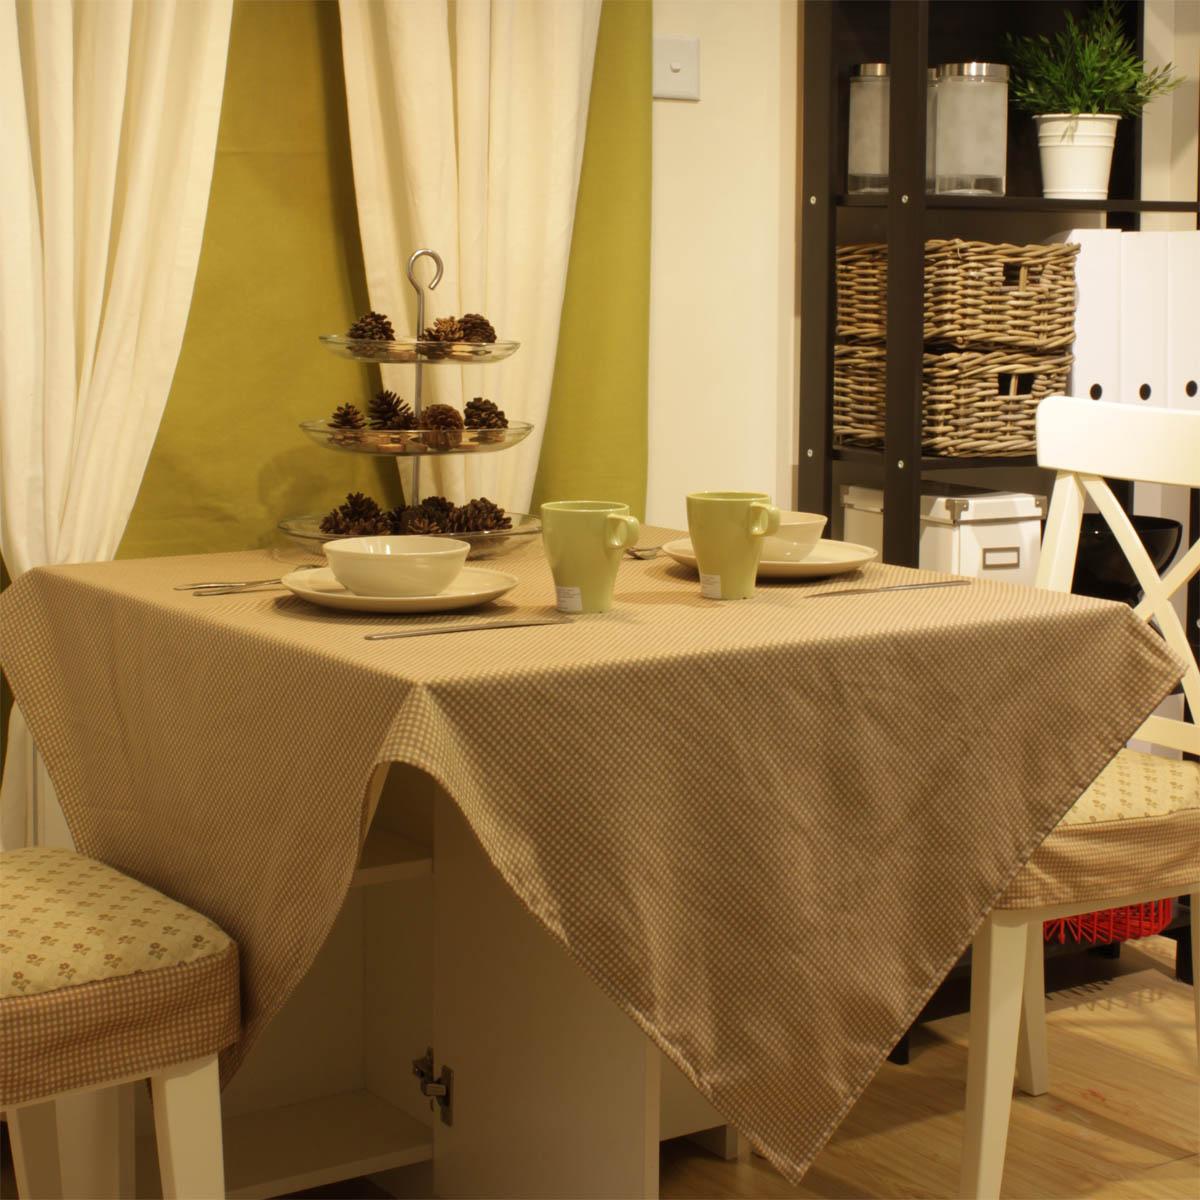 E furnishings card plaid zakka cloth dining table cloth tablecloth table cloth customize(China (Mainland))